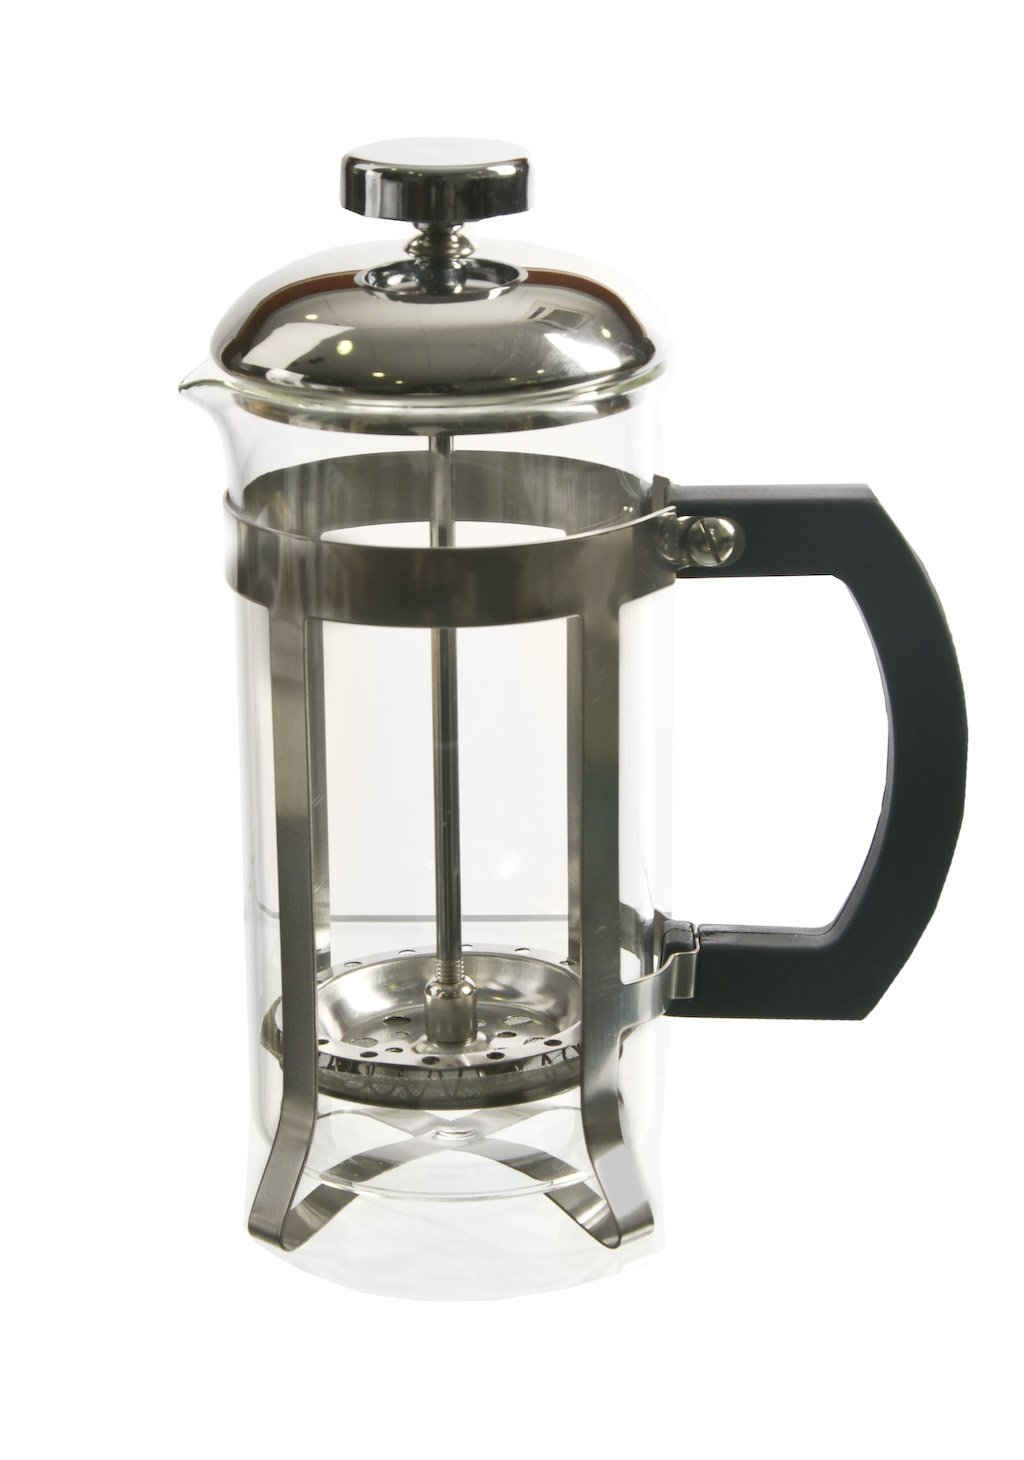 Cafetera/Tetera Embolo 350ml: Amazon.es: Hogar